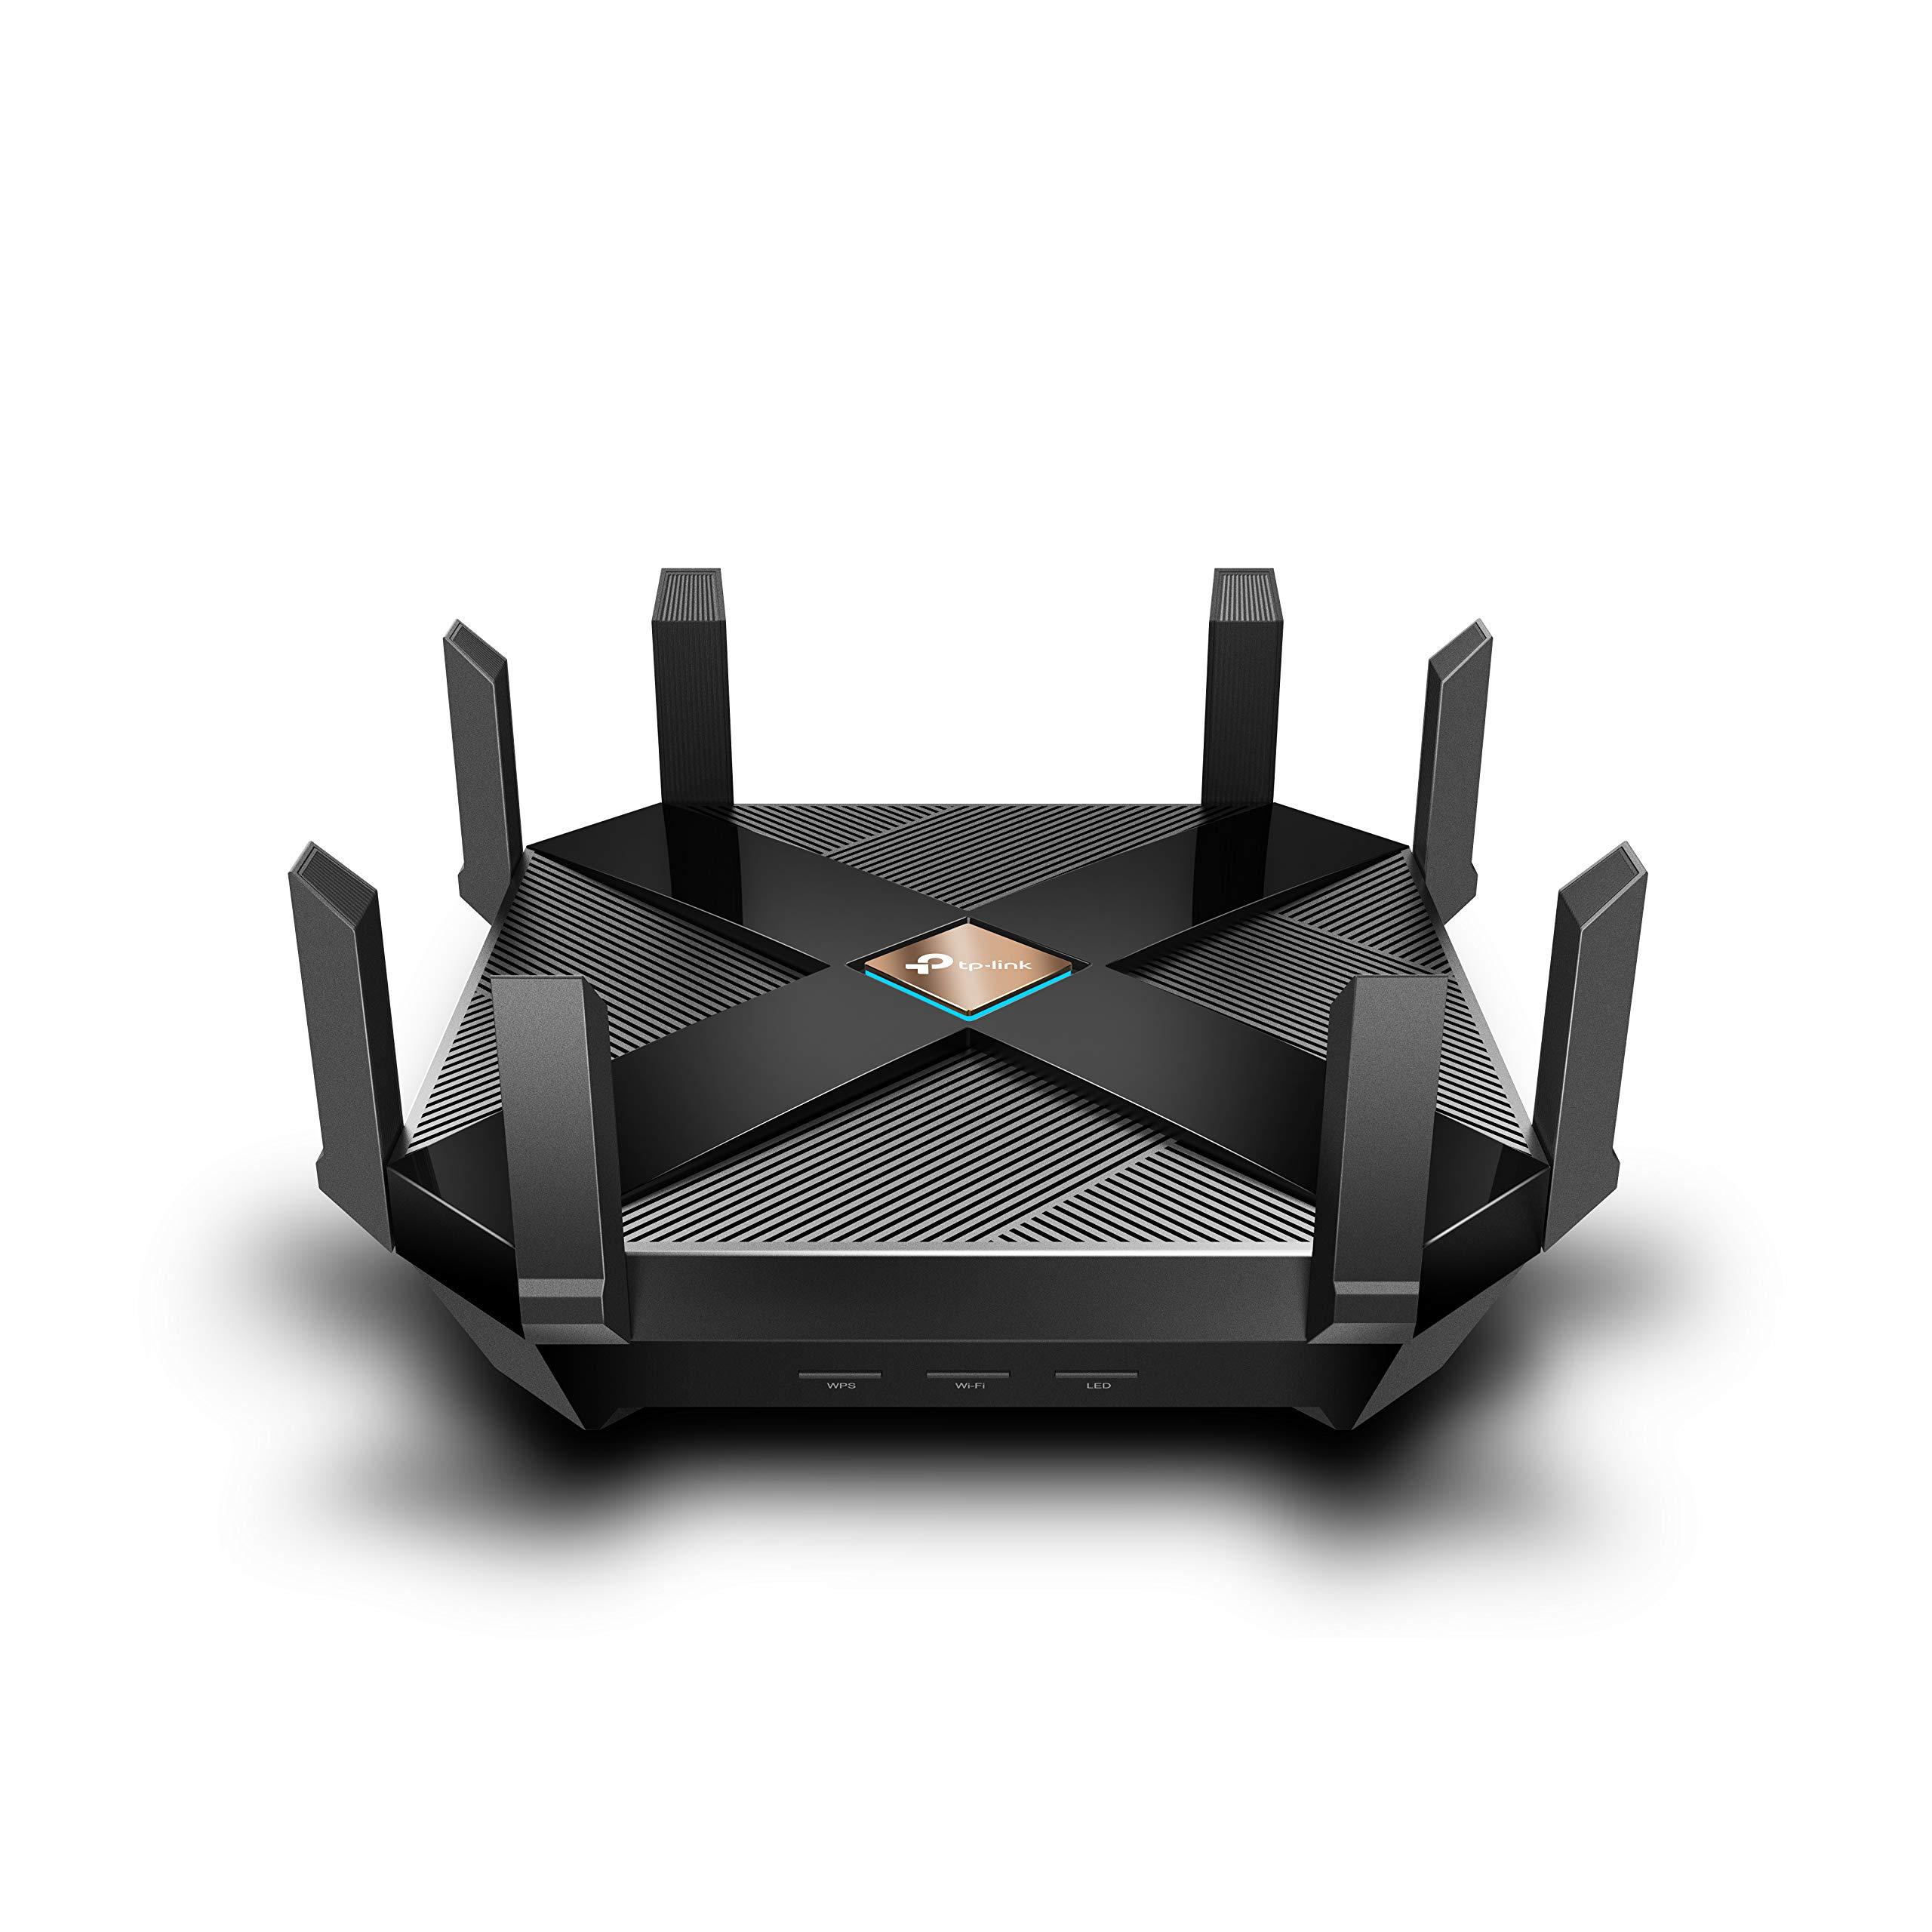 TP-Link WiFi 6 AX6000 8-Stream Smart WiFi Router - Next-Gen 802.11ax, 2.5G WAN Port, 8 Gigabit LAN Ports, MU-MIMO, 1.8GHz Quad-Core CPU, USB 3.0 Ports, Homecare Support(Archer AX6000)